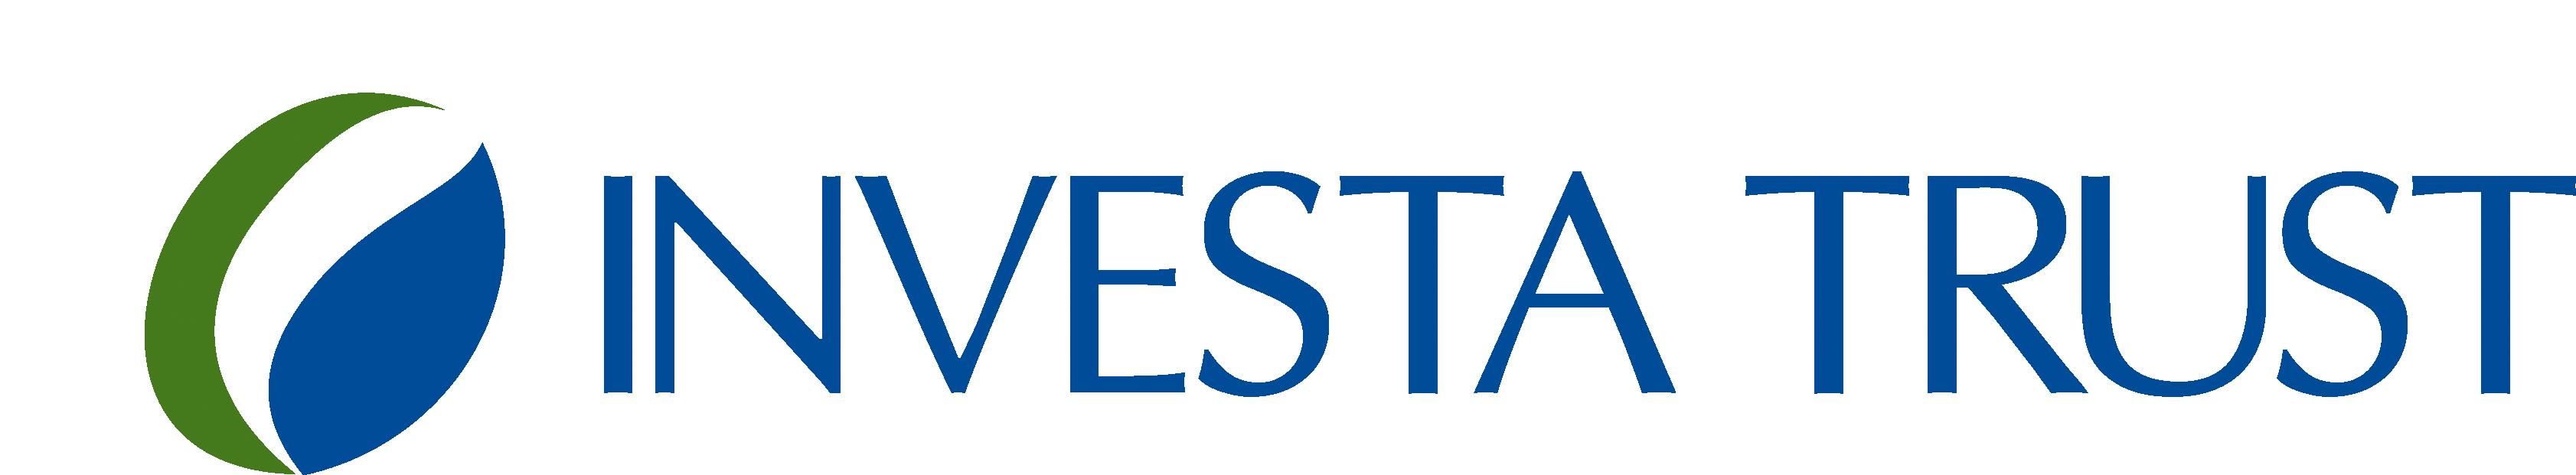 investa-logo-2016